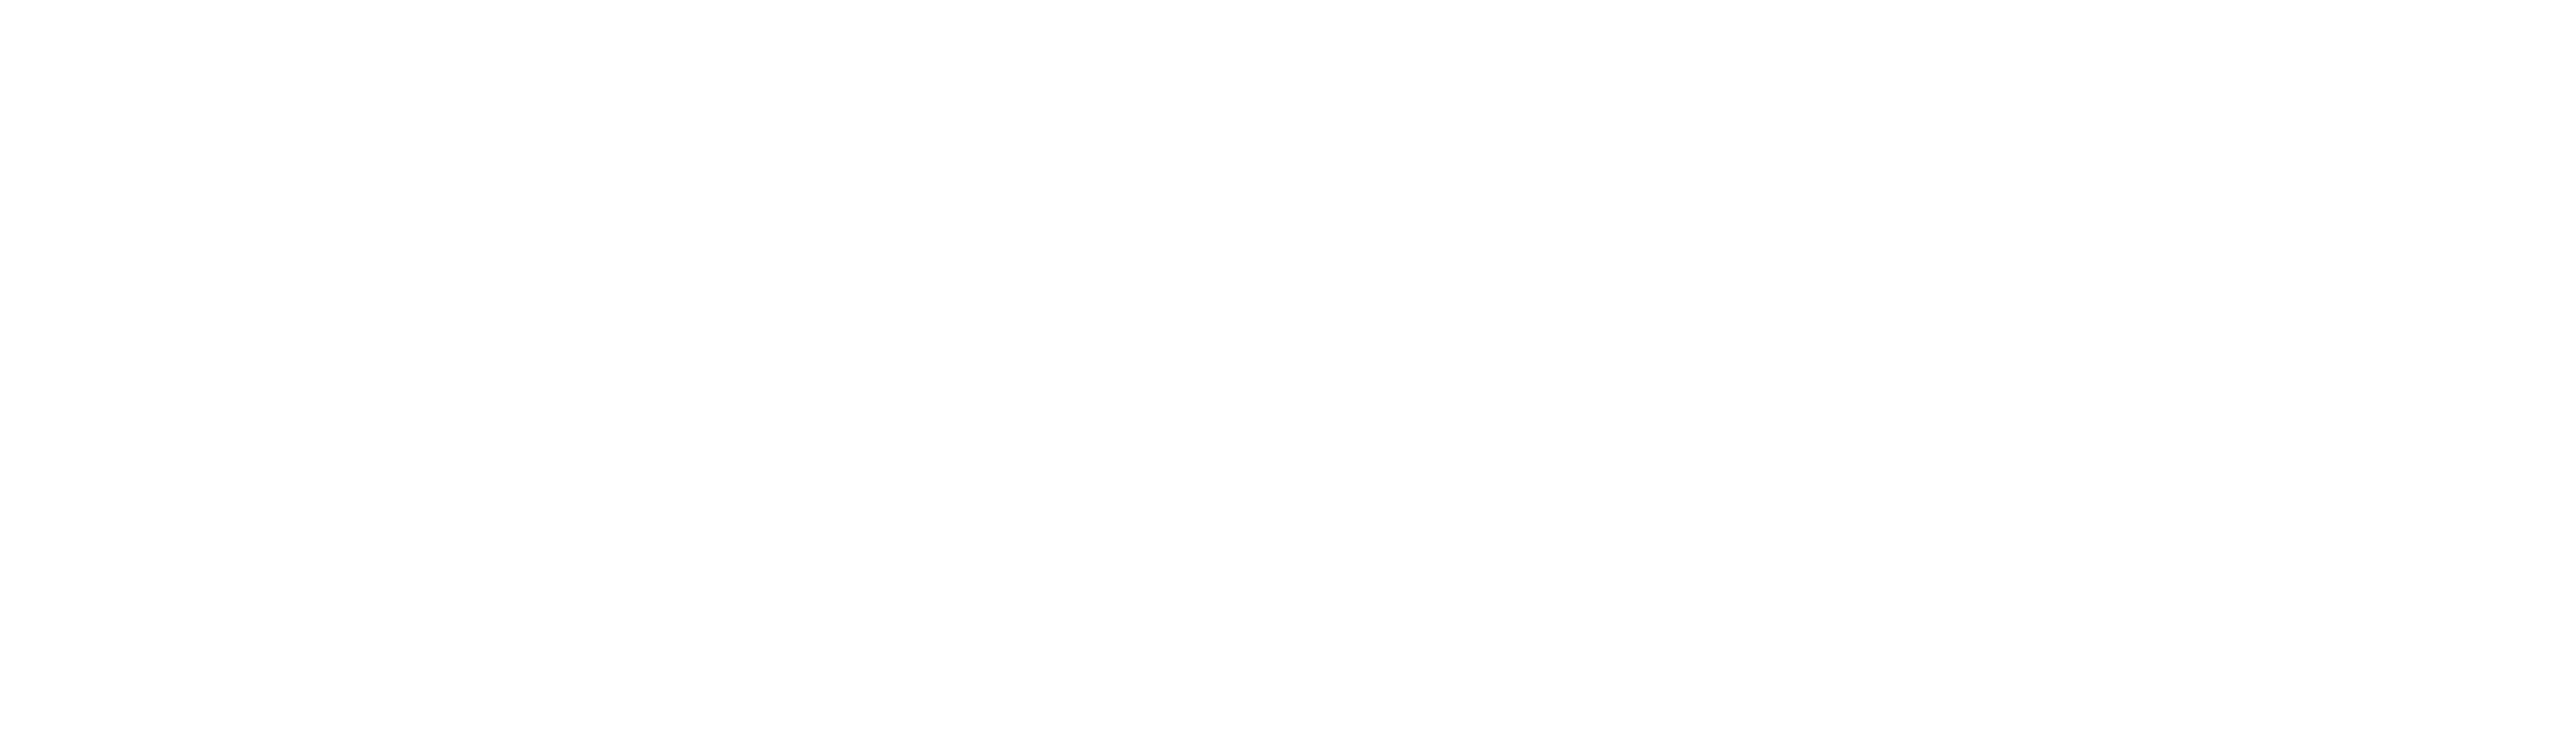 logo elevator white